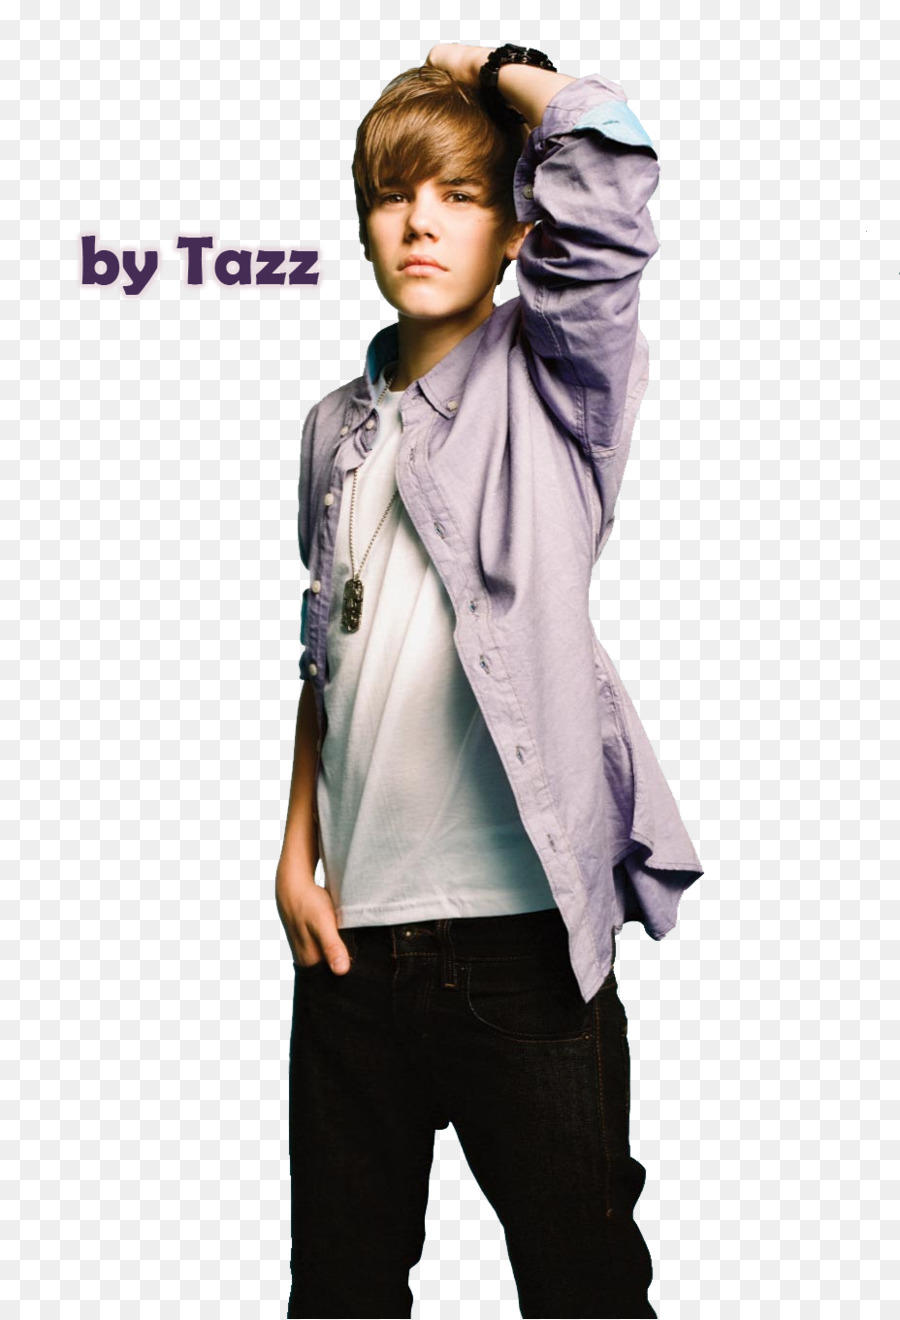 Justin Bieber Desktop Wallpaper High Definition Television 1080p